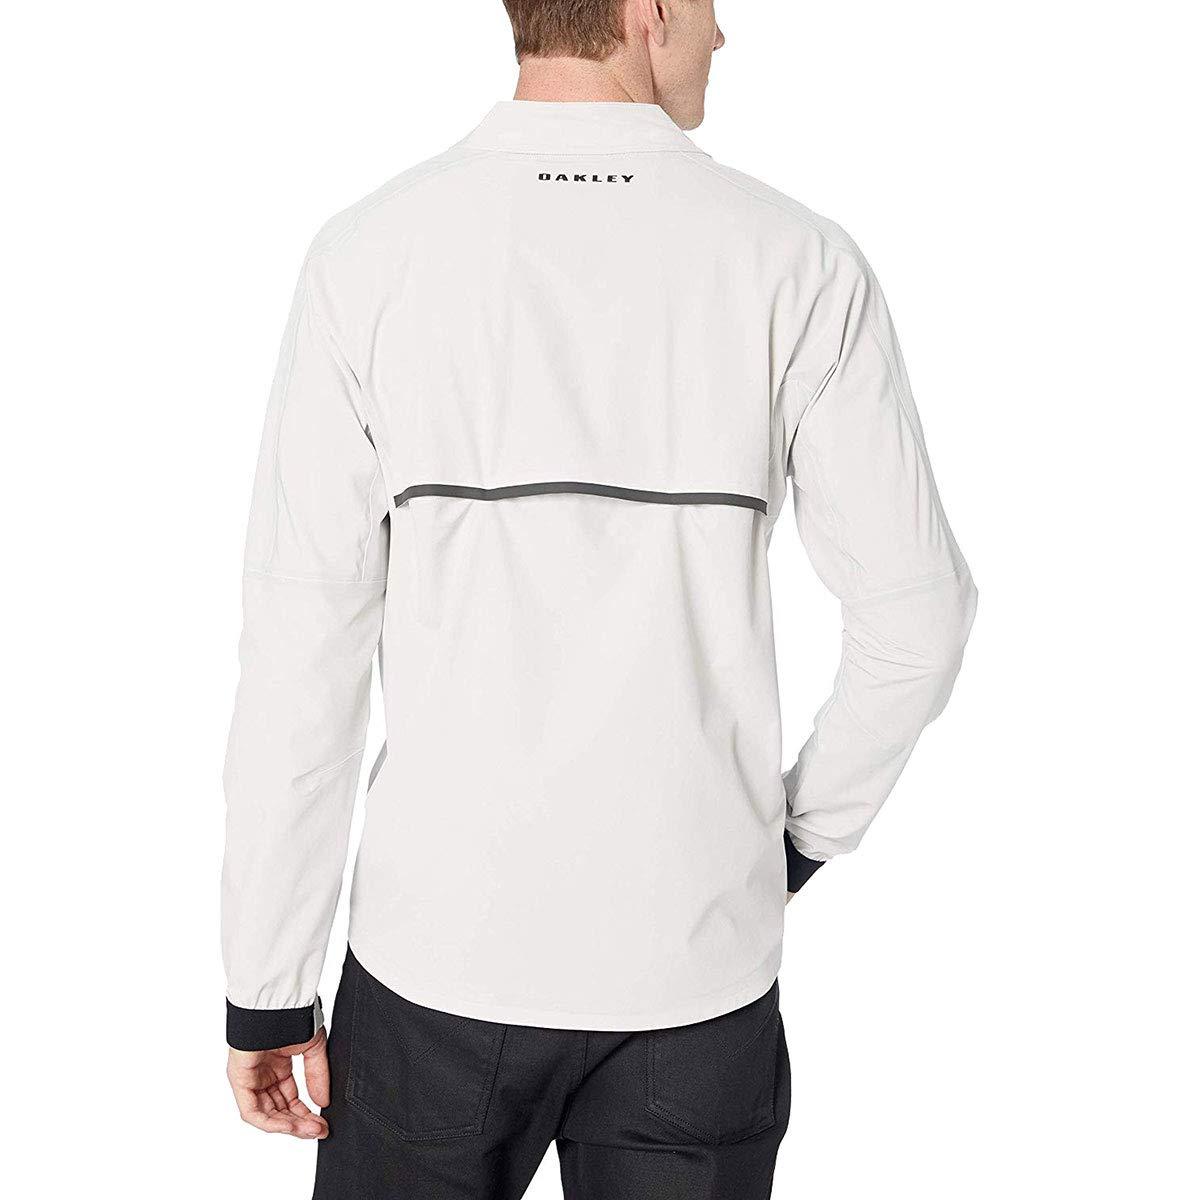 Amazon.com: Oakley Velocity - Chaqueta para hombre: Clothing